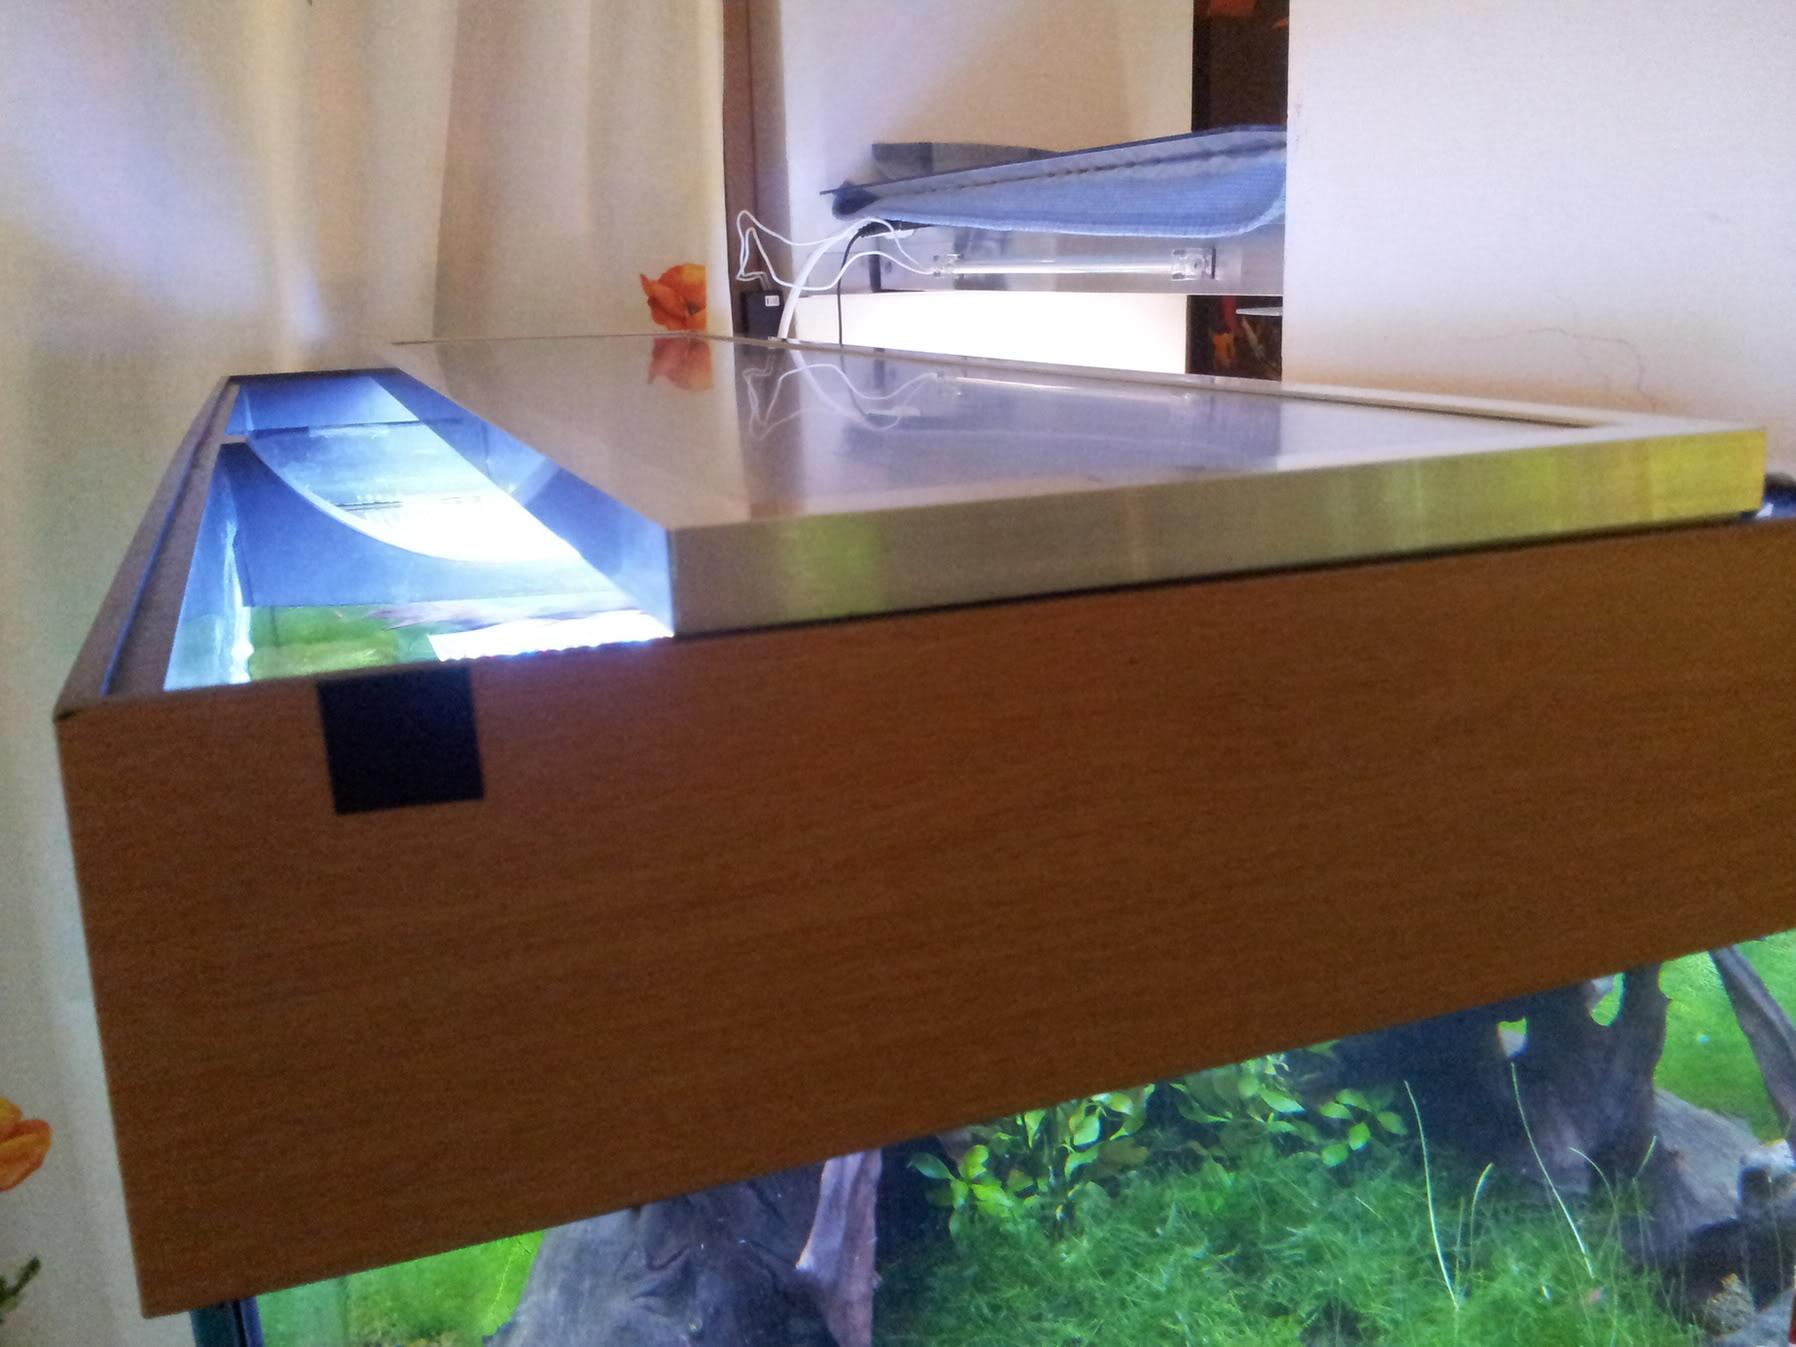 Fabrication galerie LED pour Juwel rio 125 (80cmx20cmx1.8cm) 20120715_205750